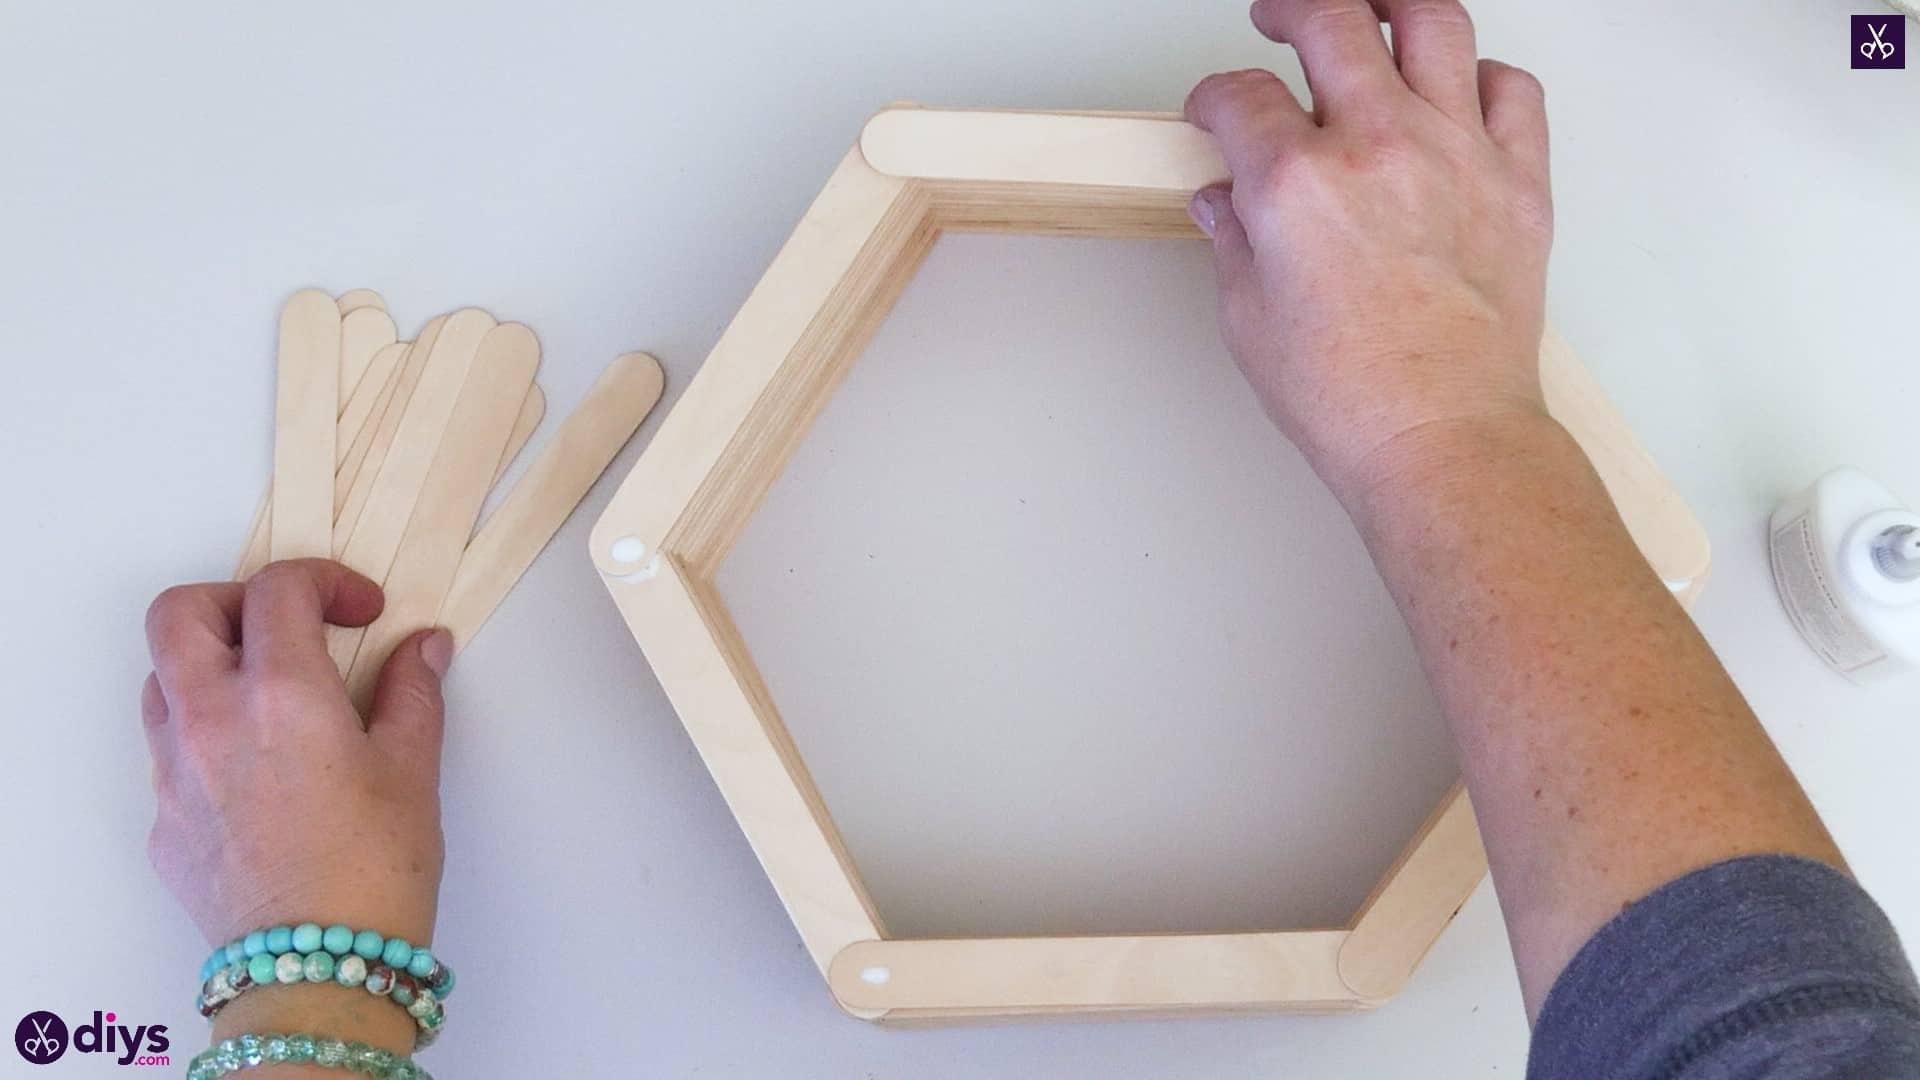 Diy popsicle stick hexagon shelf step 3b